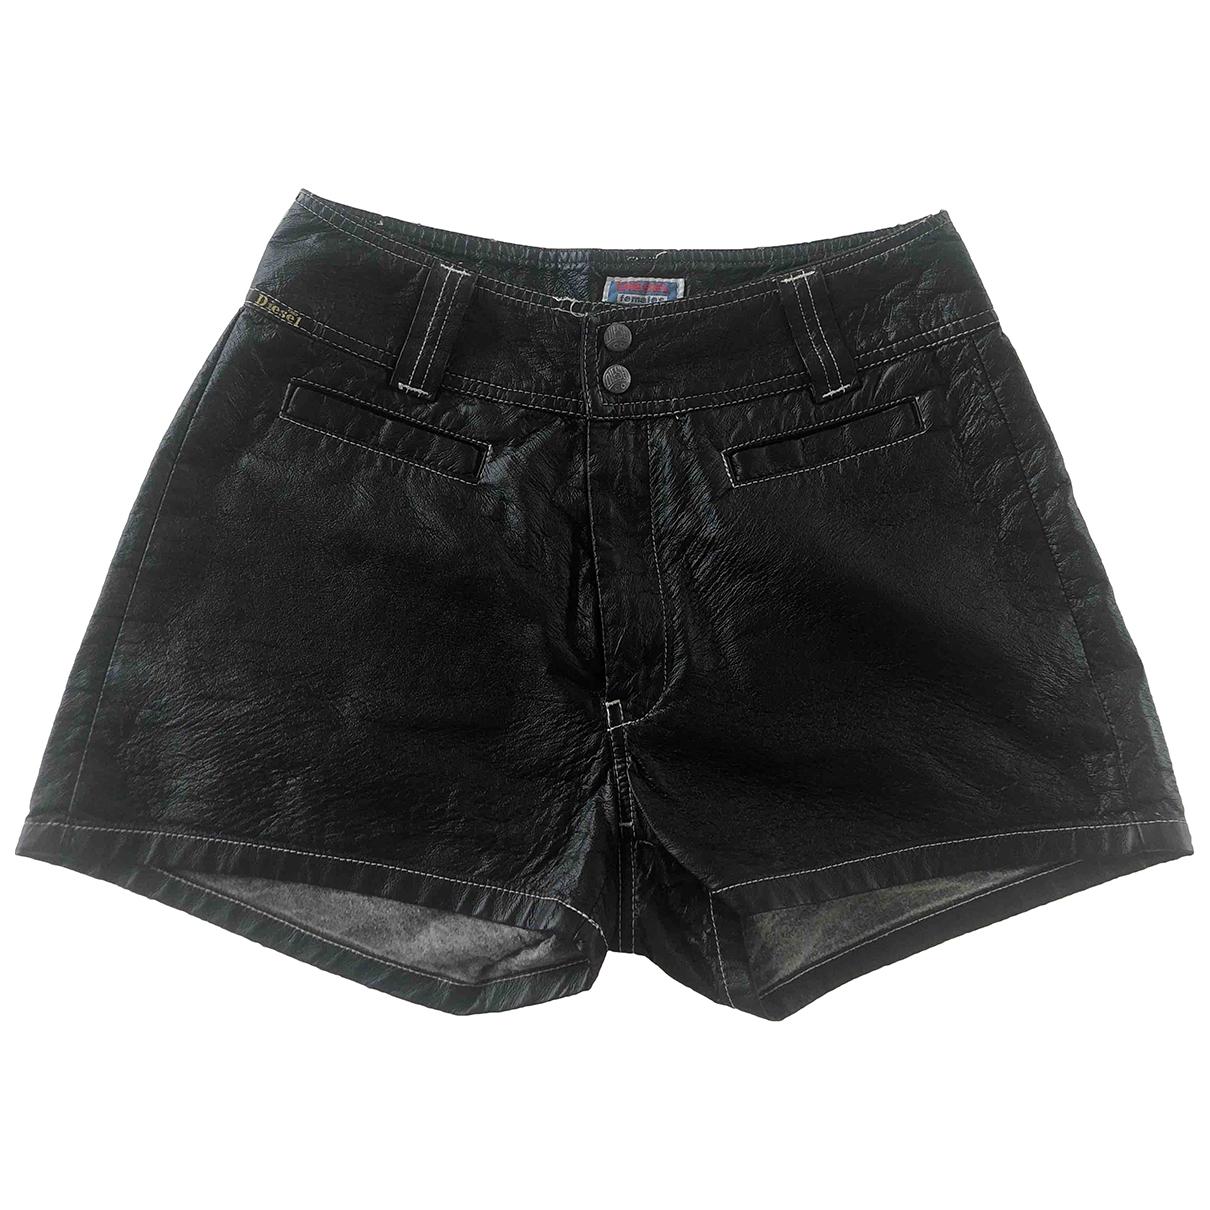 Diesel \N Shorts in  Schwarz Synthetik